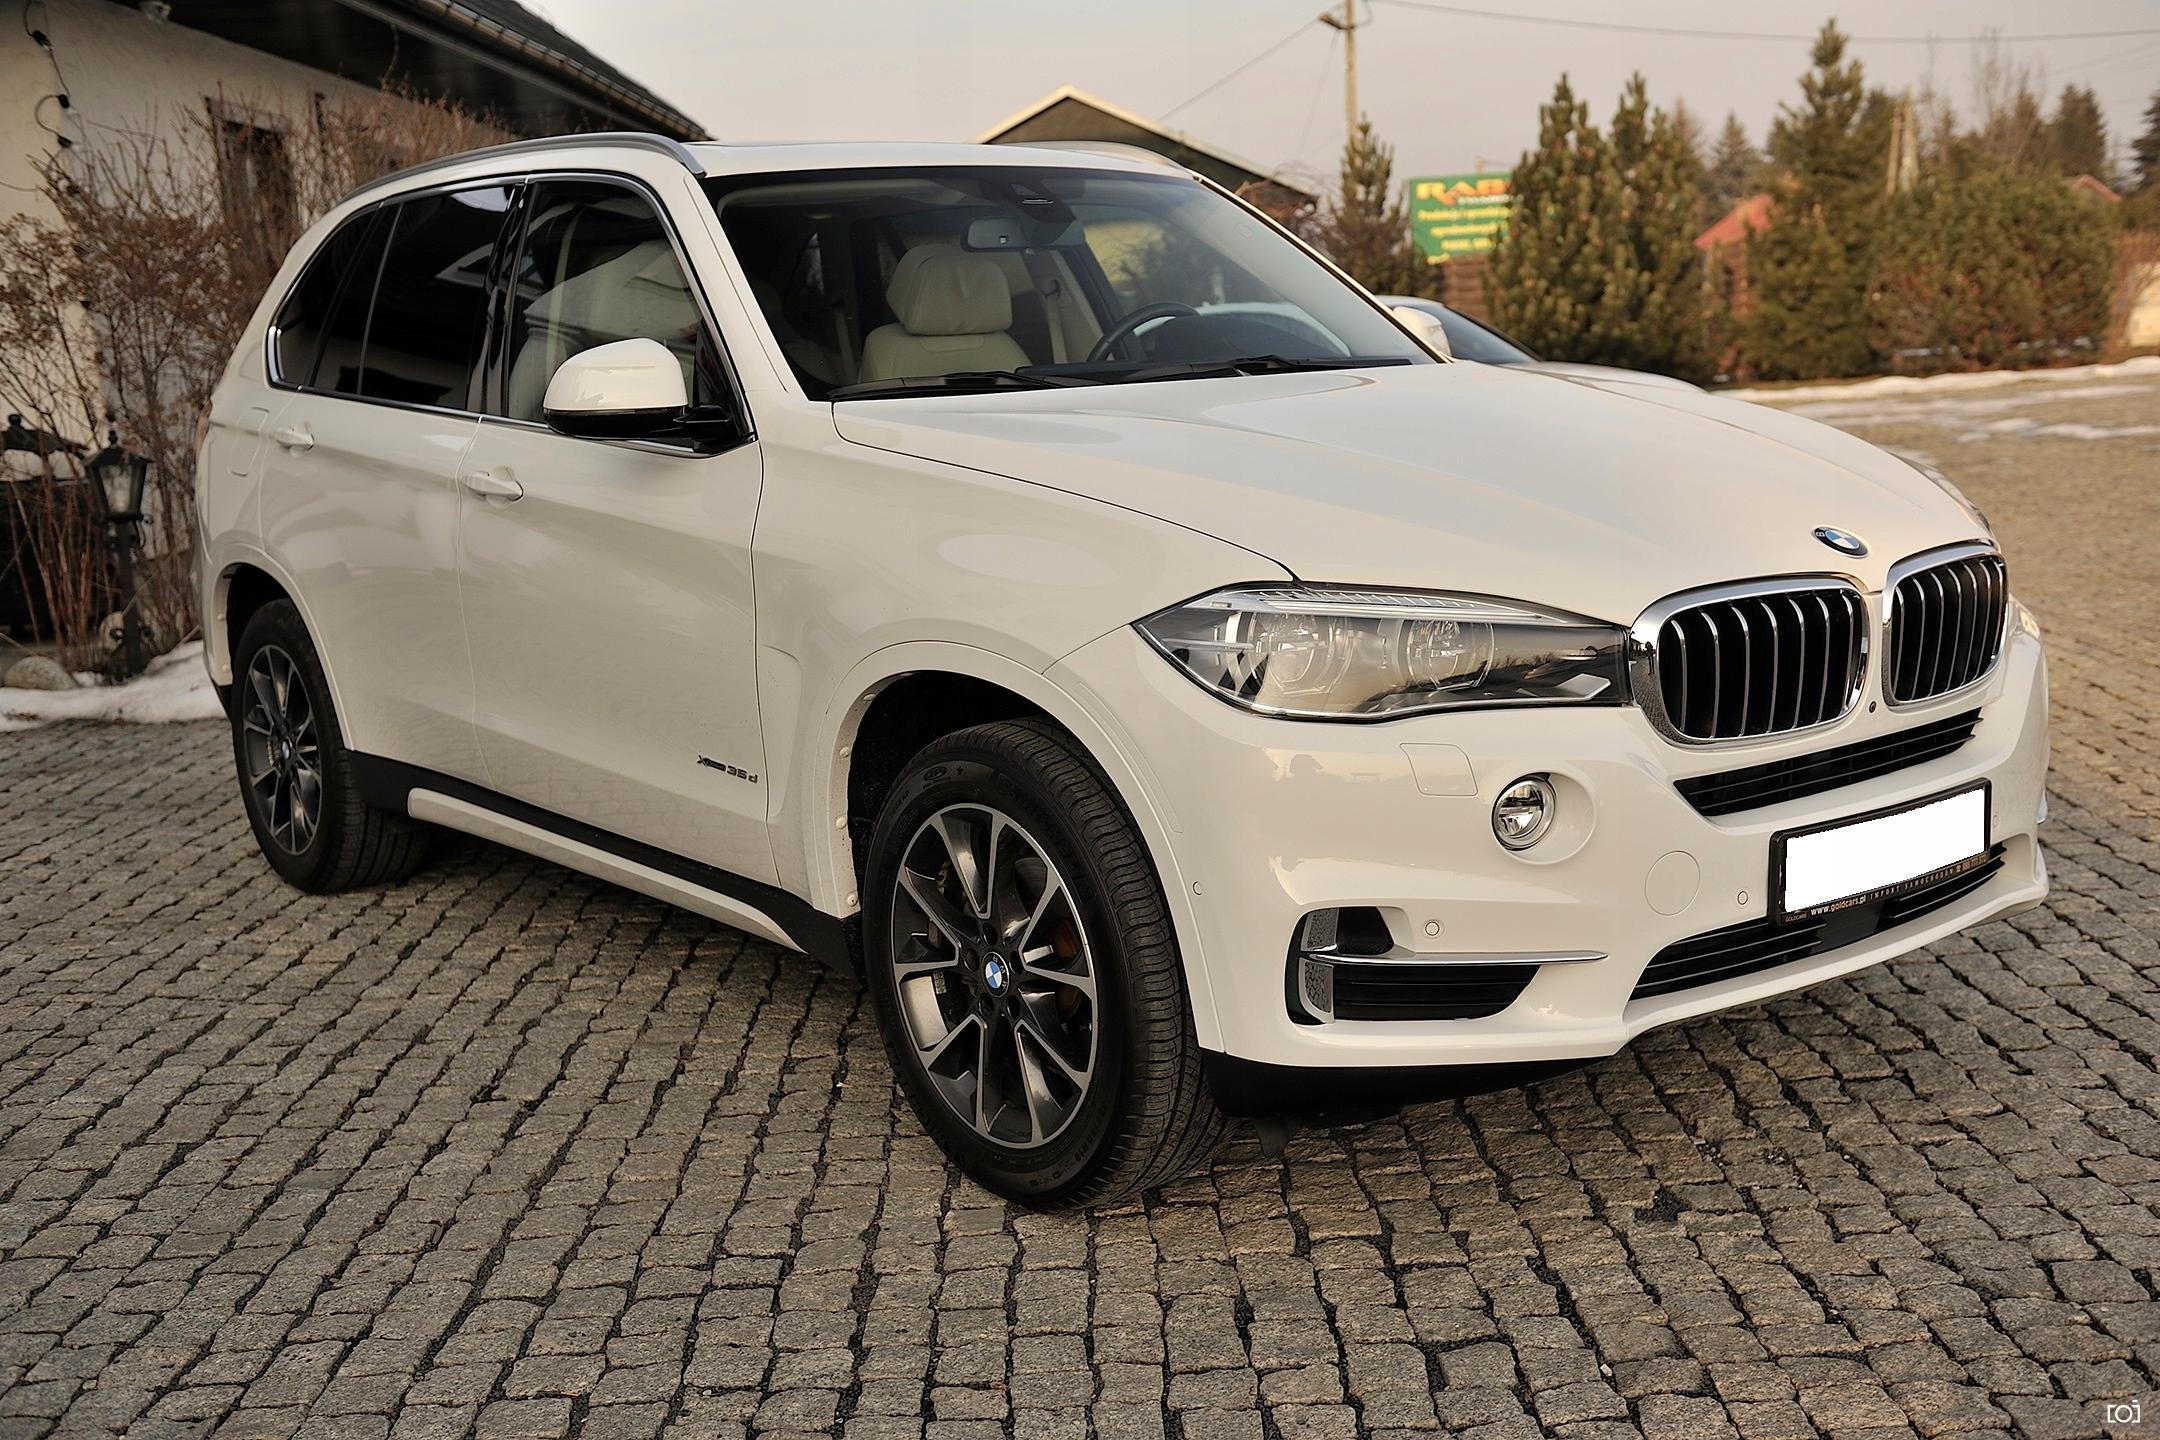 BMW X5 F15 35d Faktura Vat, ACC, Night Vision